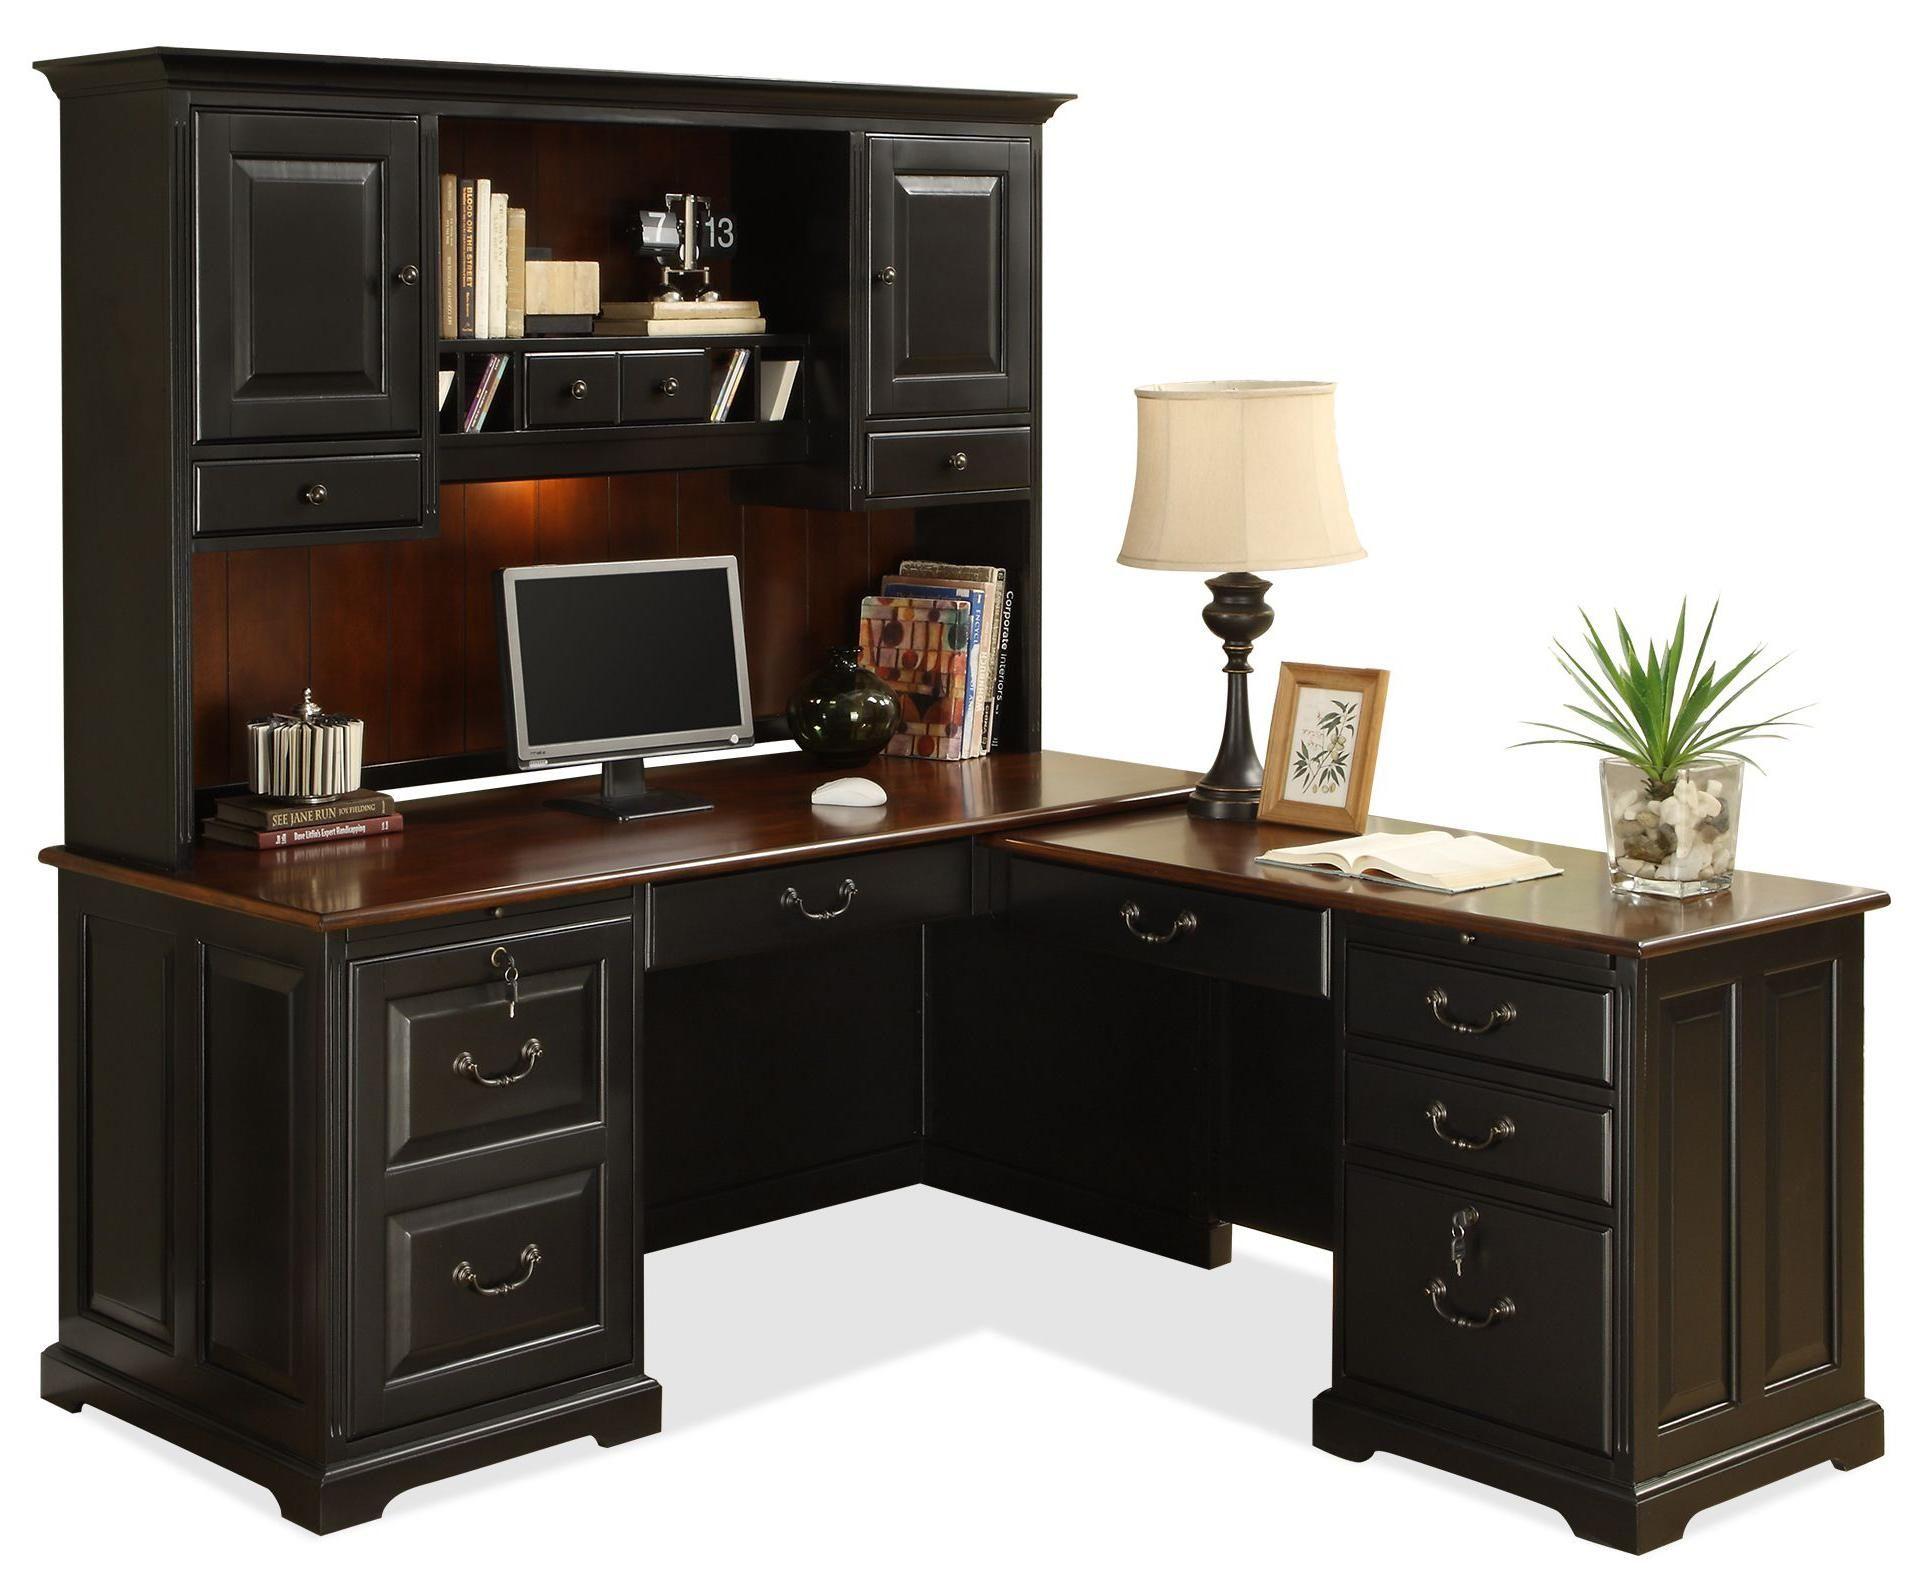 99 Black Office Desk Hutch Contemporary Home Furniture Check More At Http